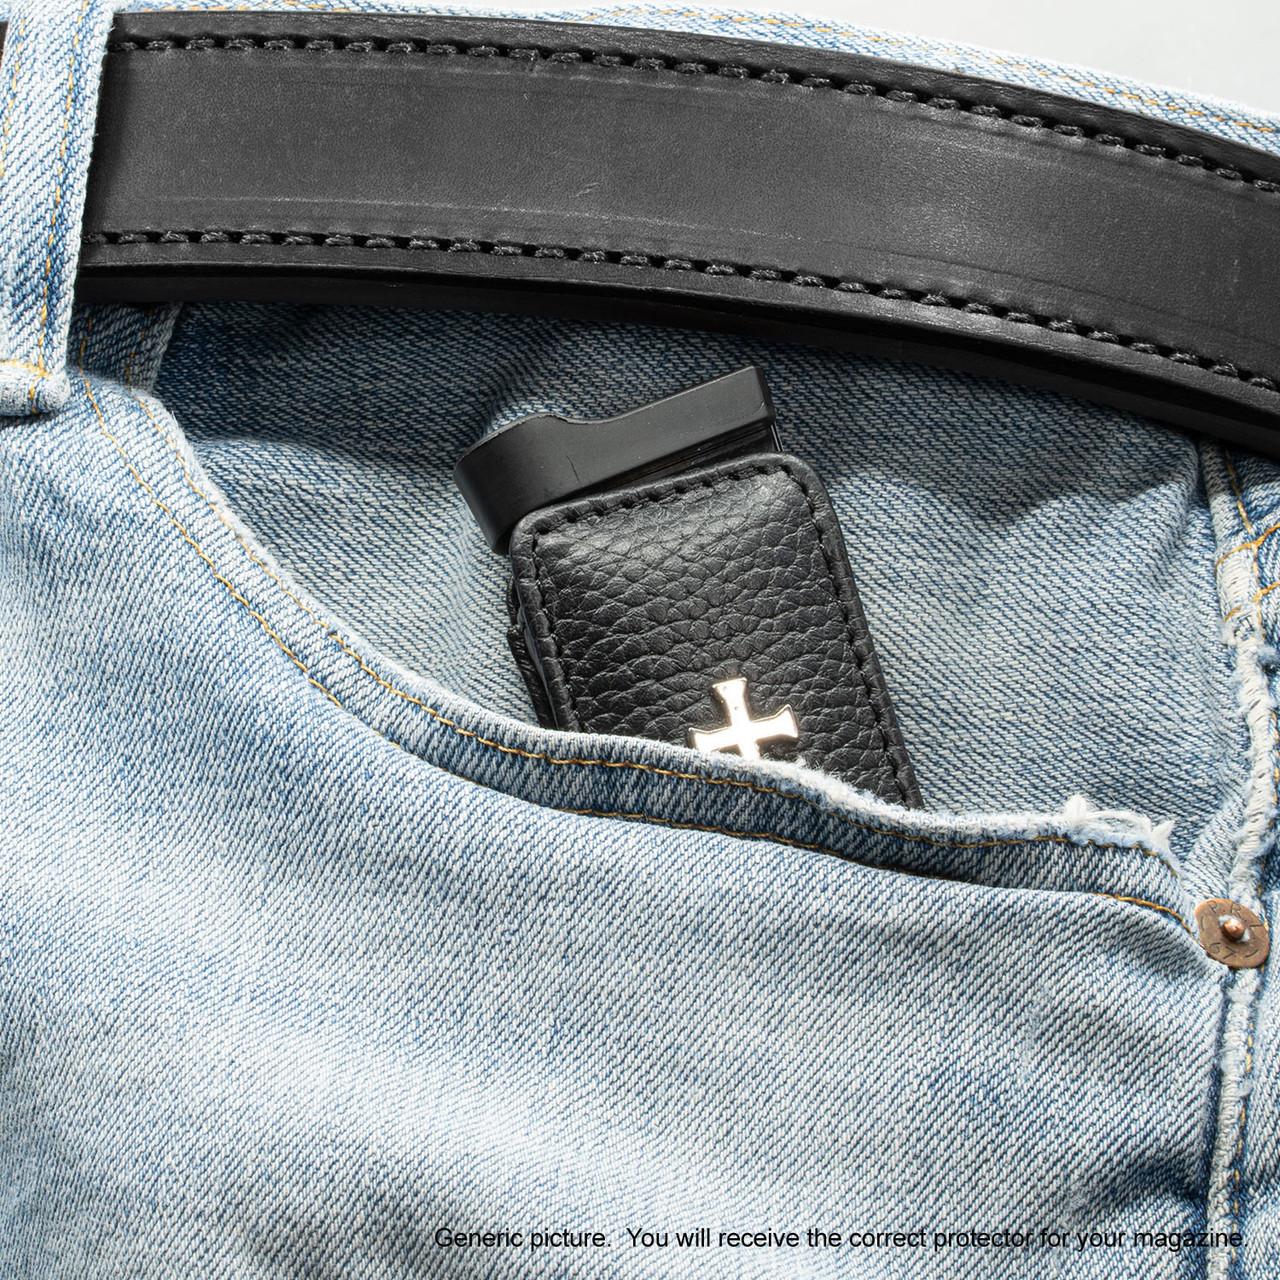 Bersa TPR9c Black Leather Cross Magazine Pocket Protector